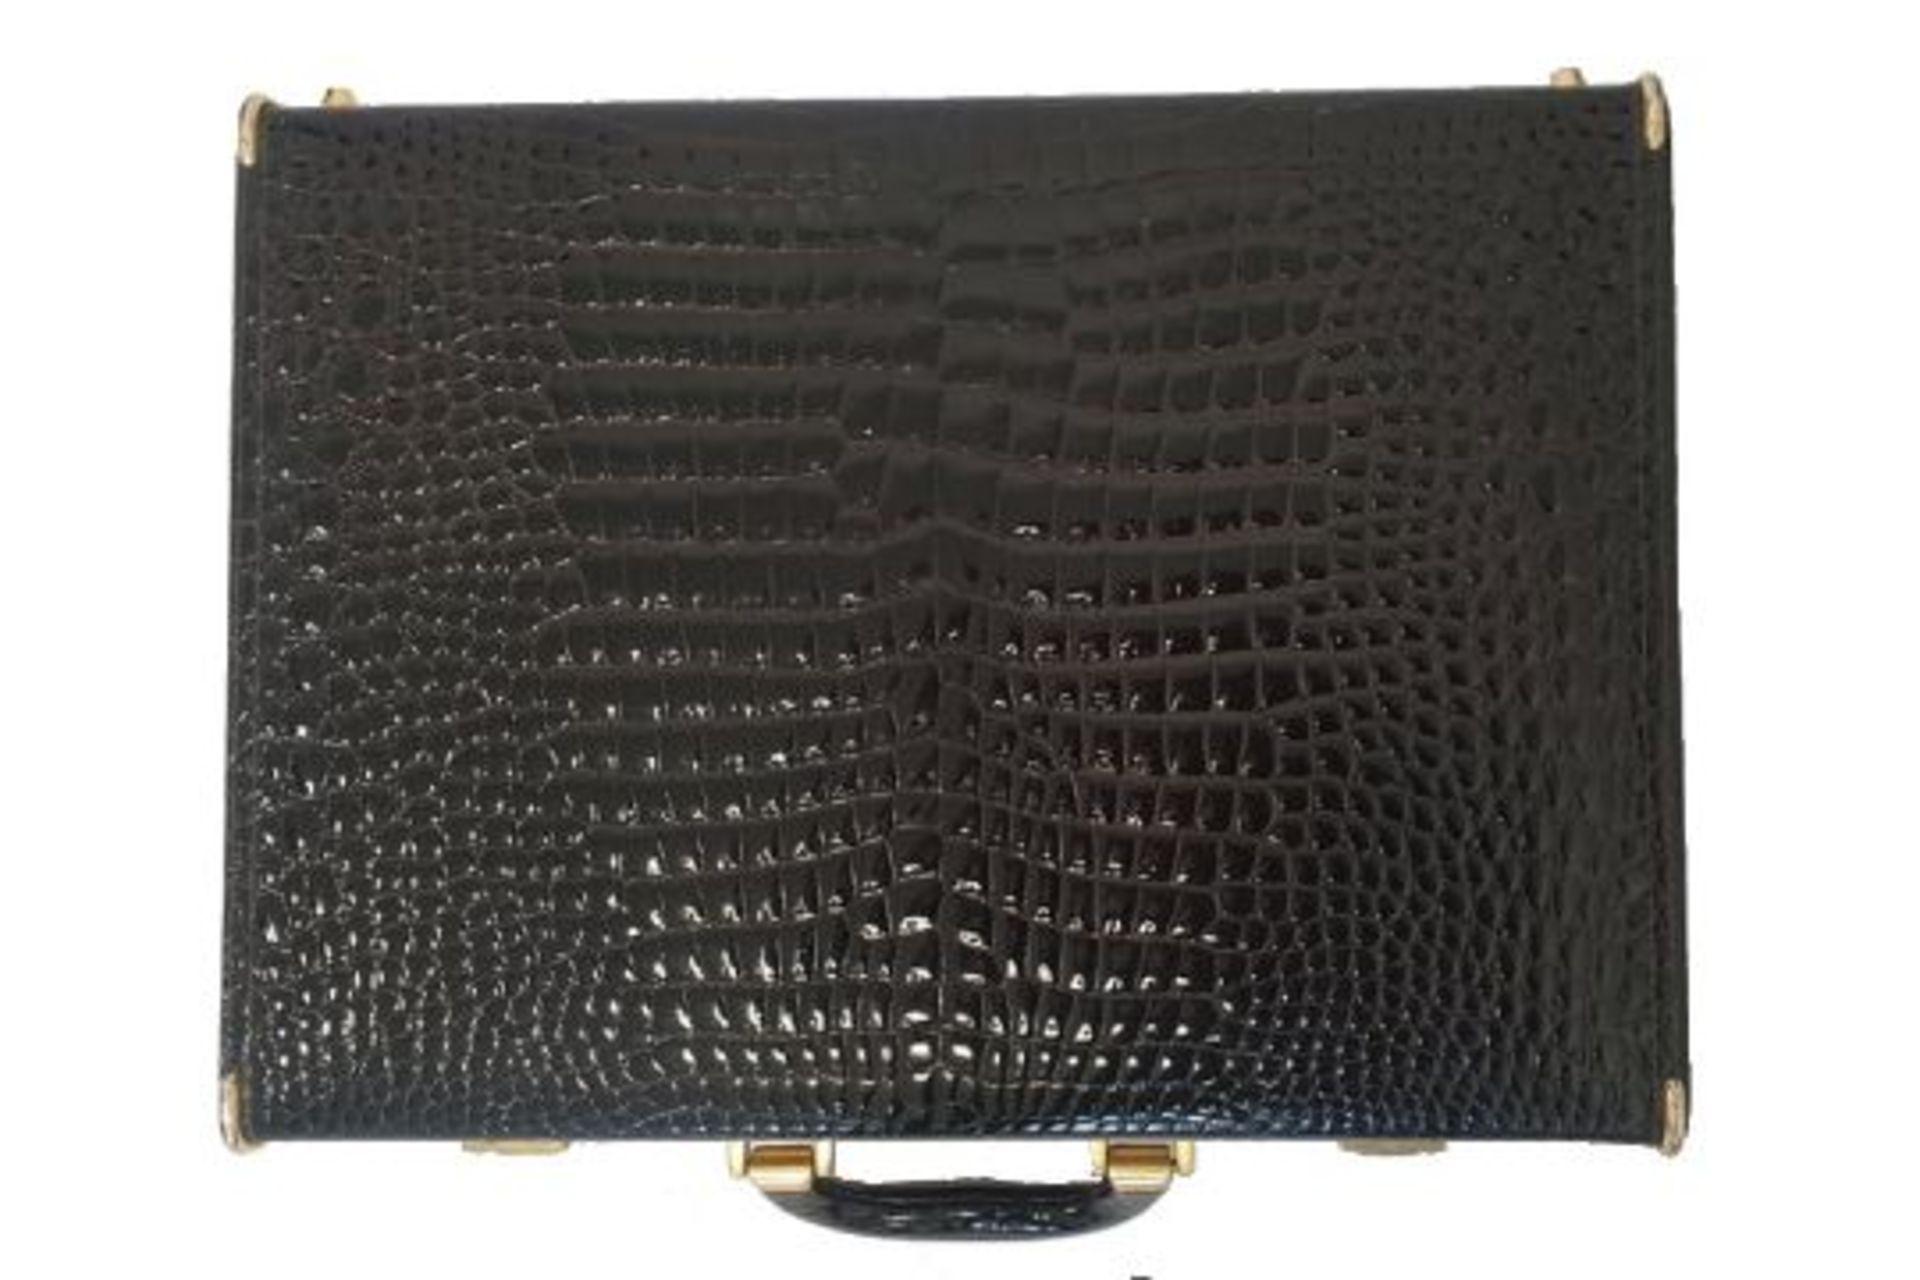 Crocodile Leather   Briefcase - Image 3 of 5